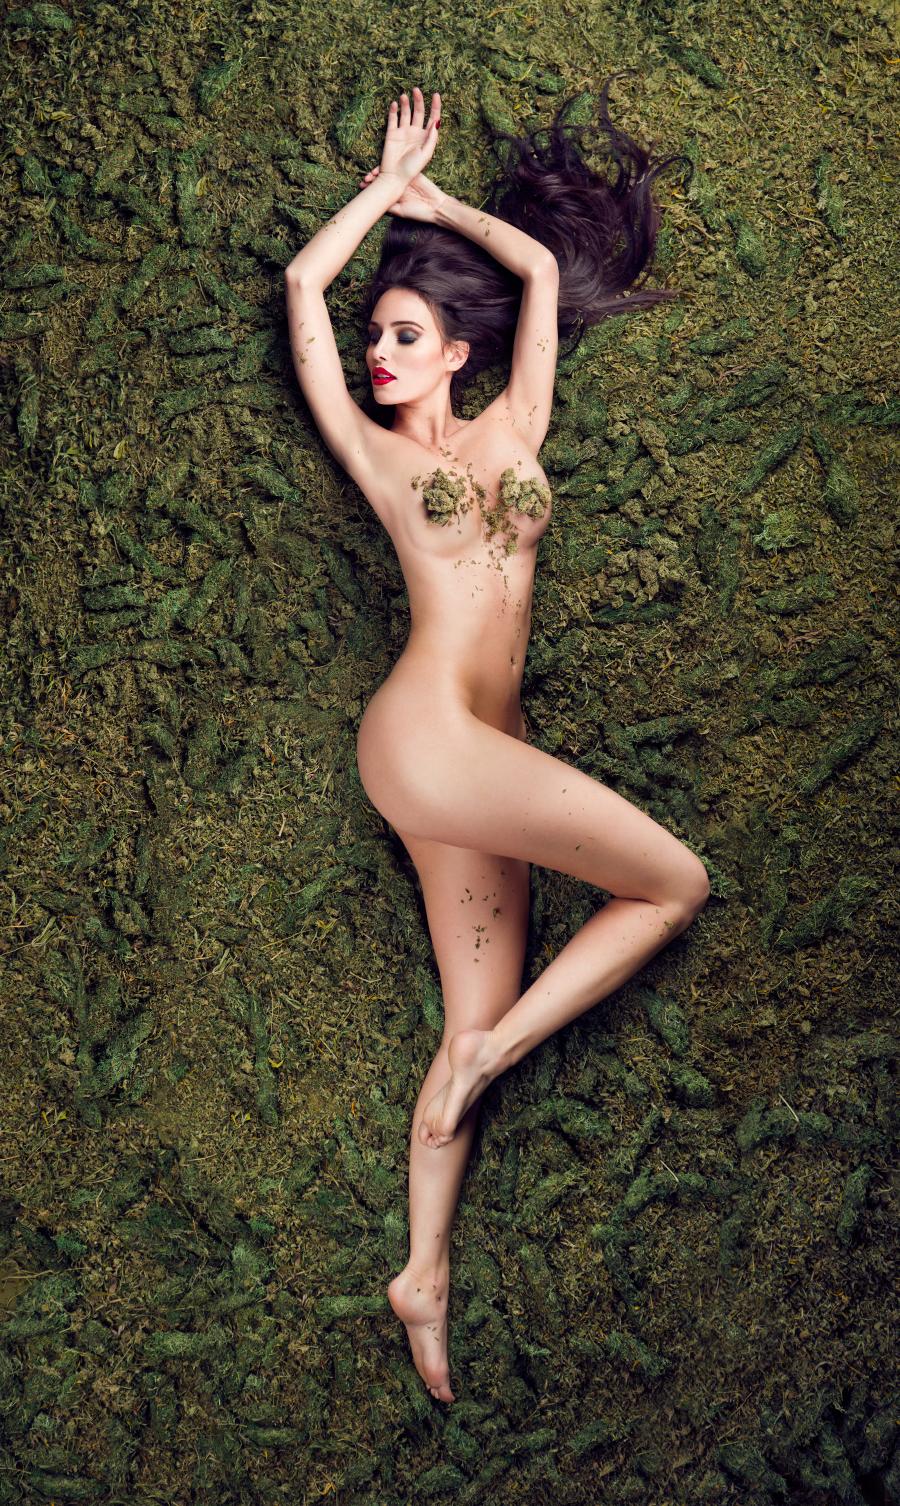 Queen of Weed by michellemonique